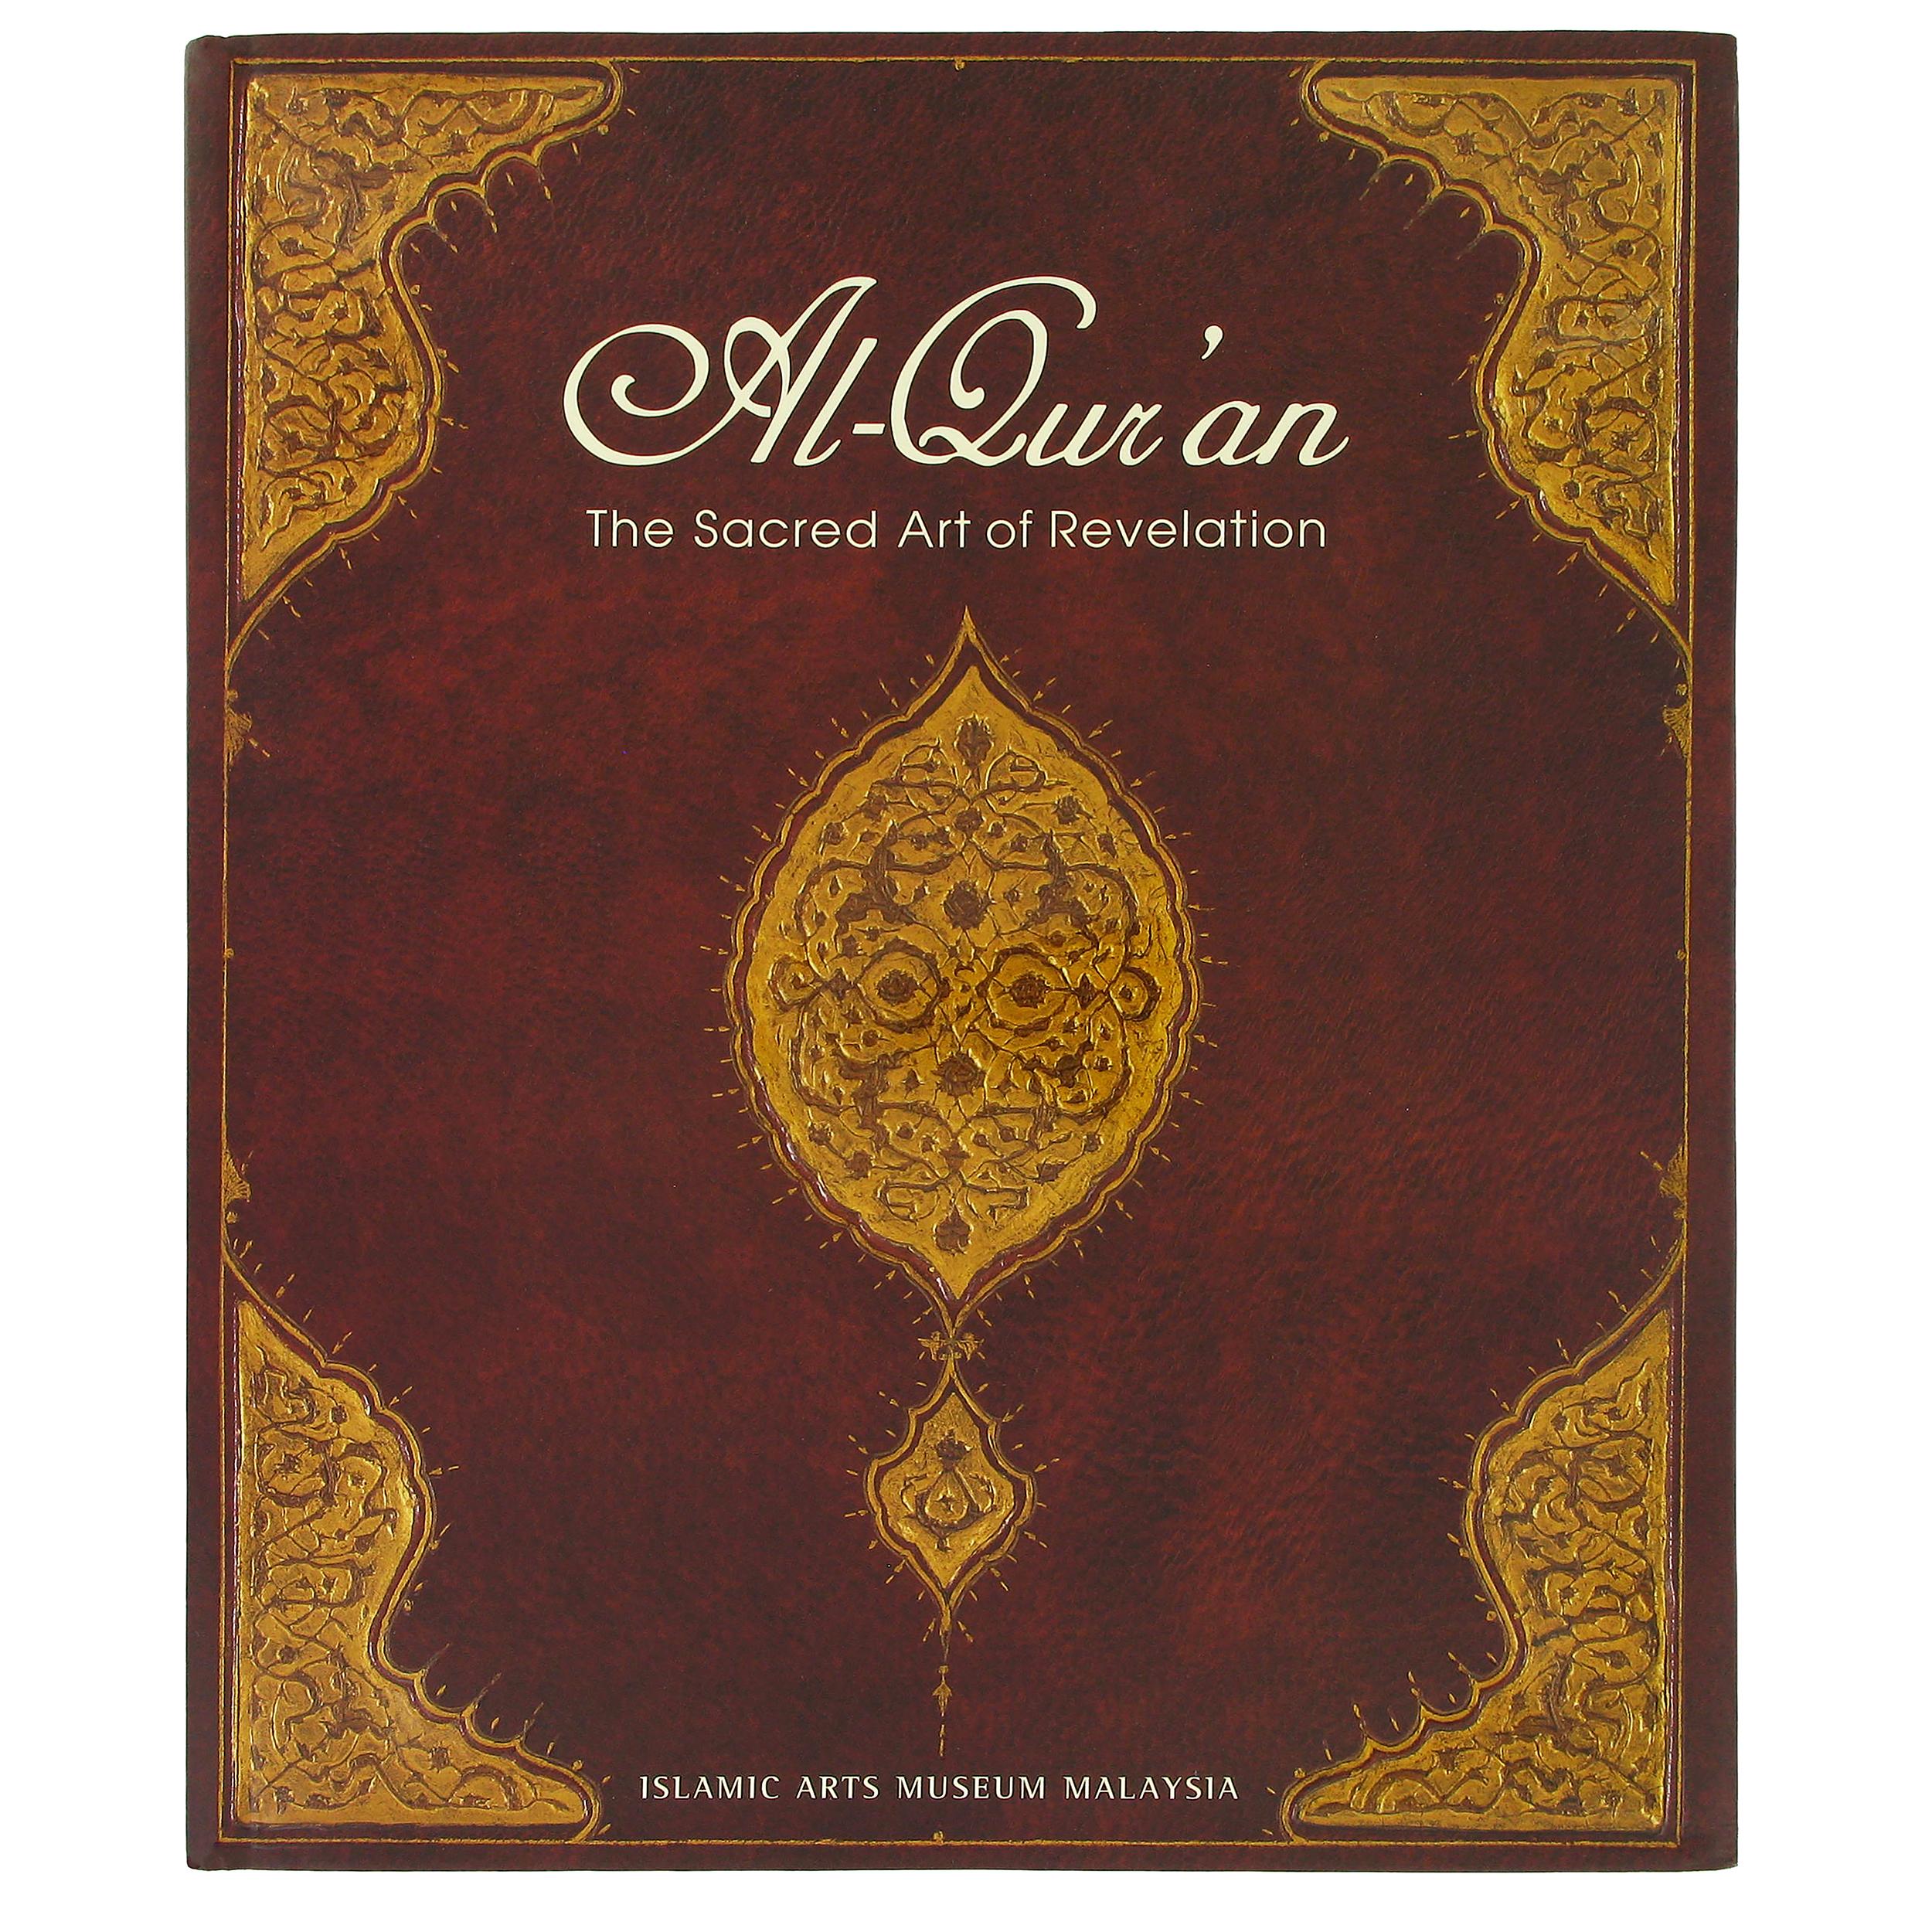 Al-Qur'an: The Sacred Art of Revelation